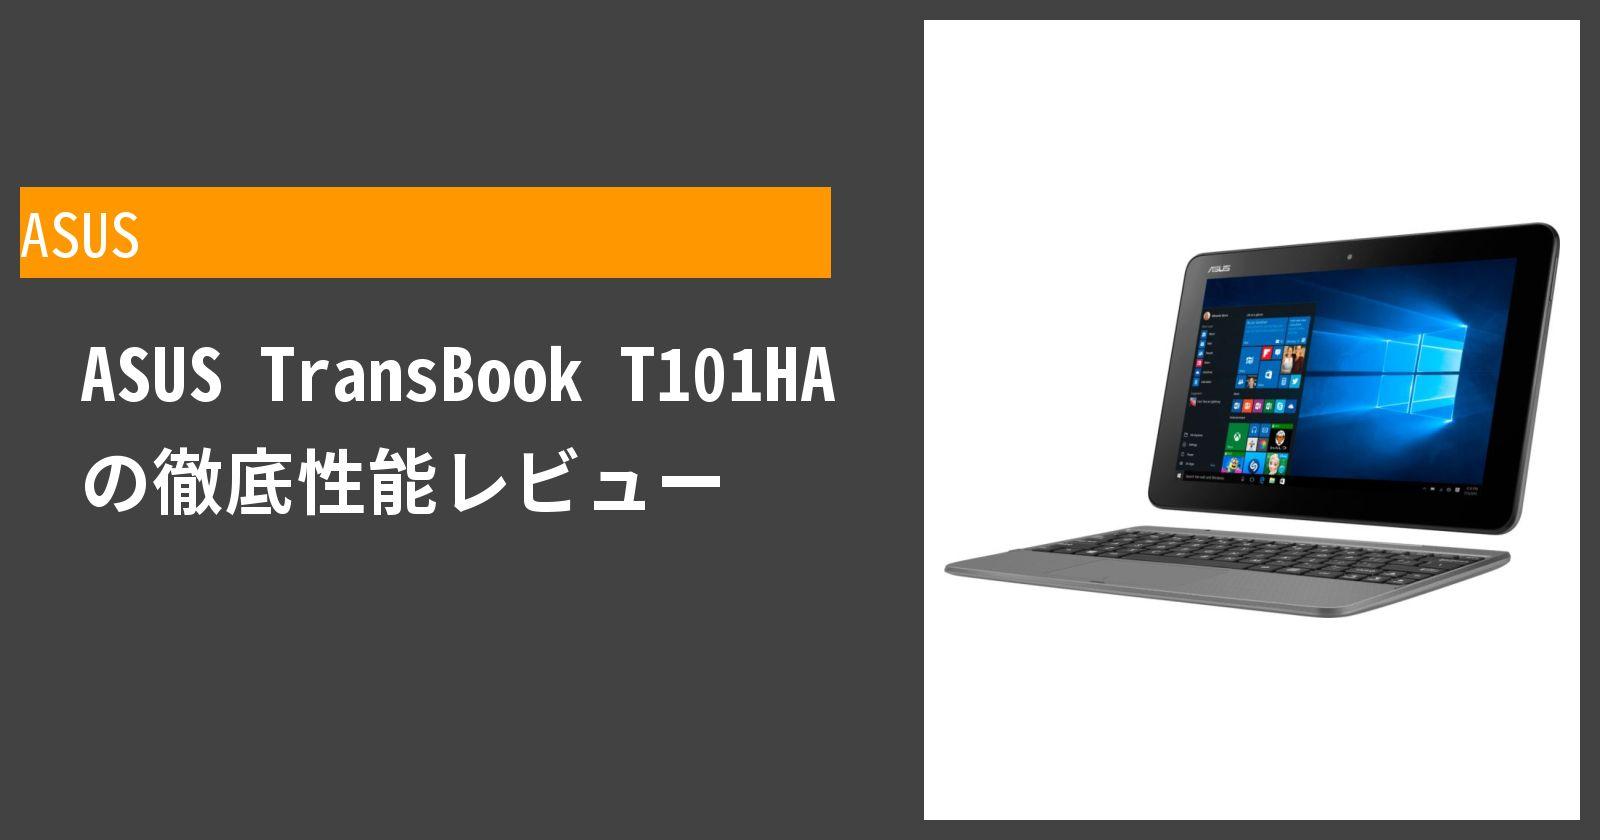 ASUS TransBook T101HA の徹底性能レビュー